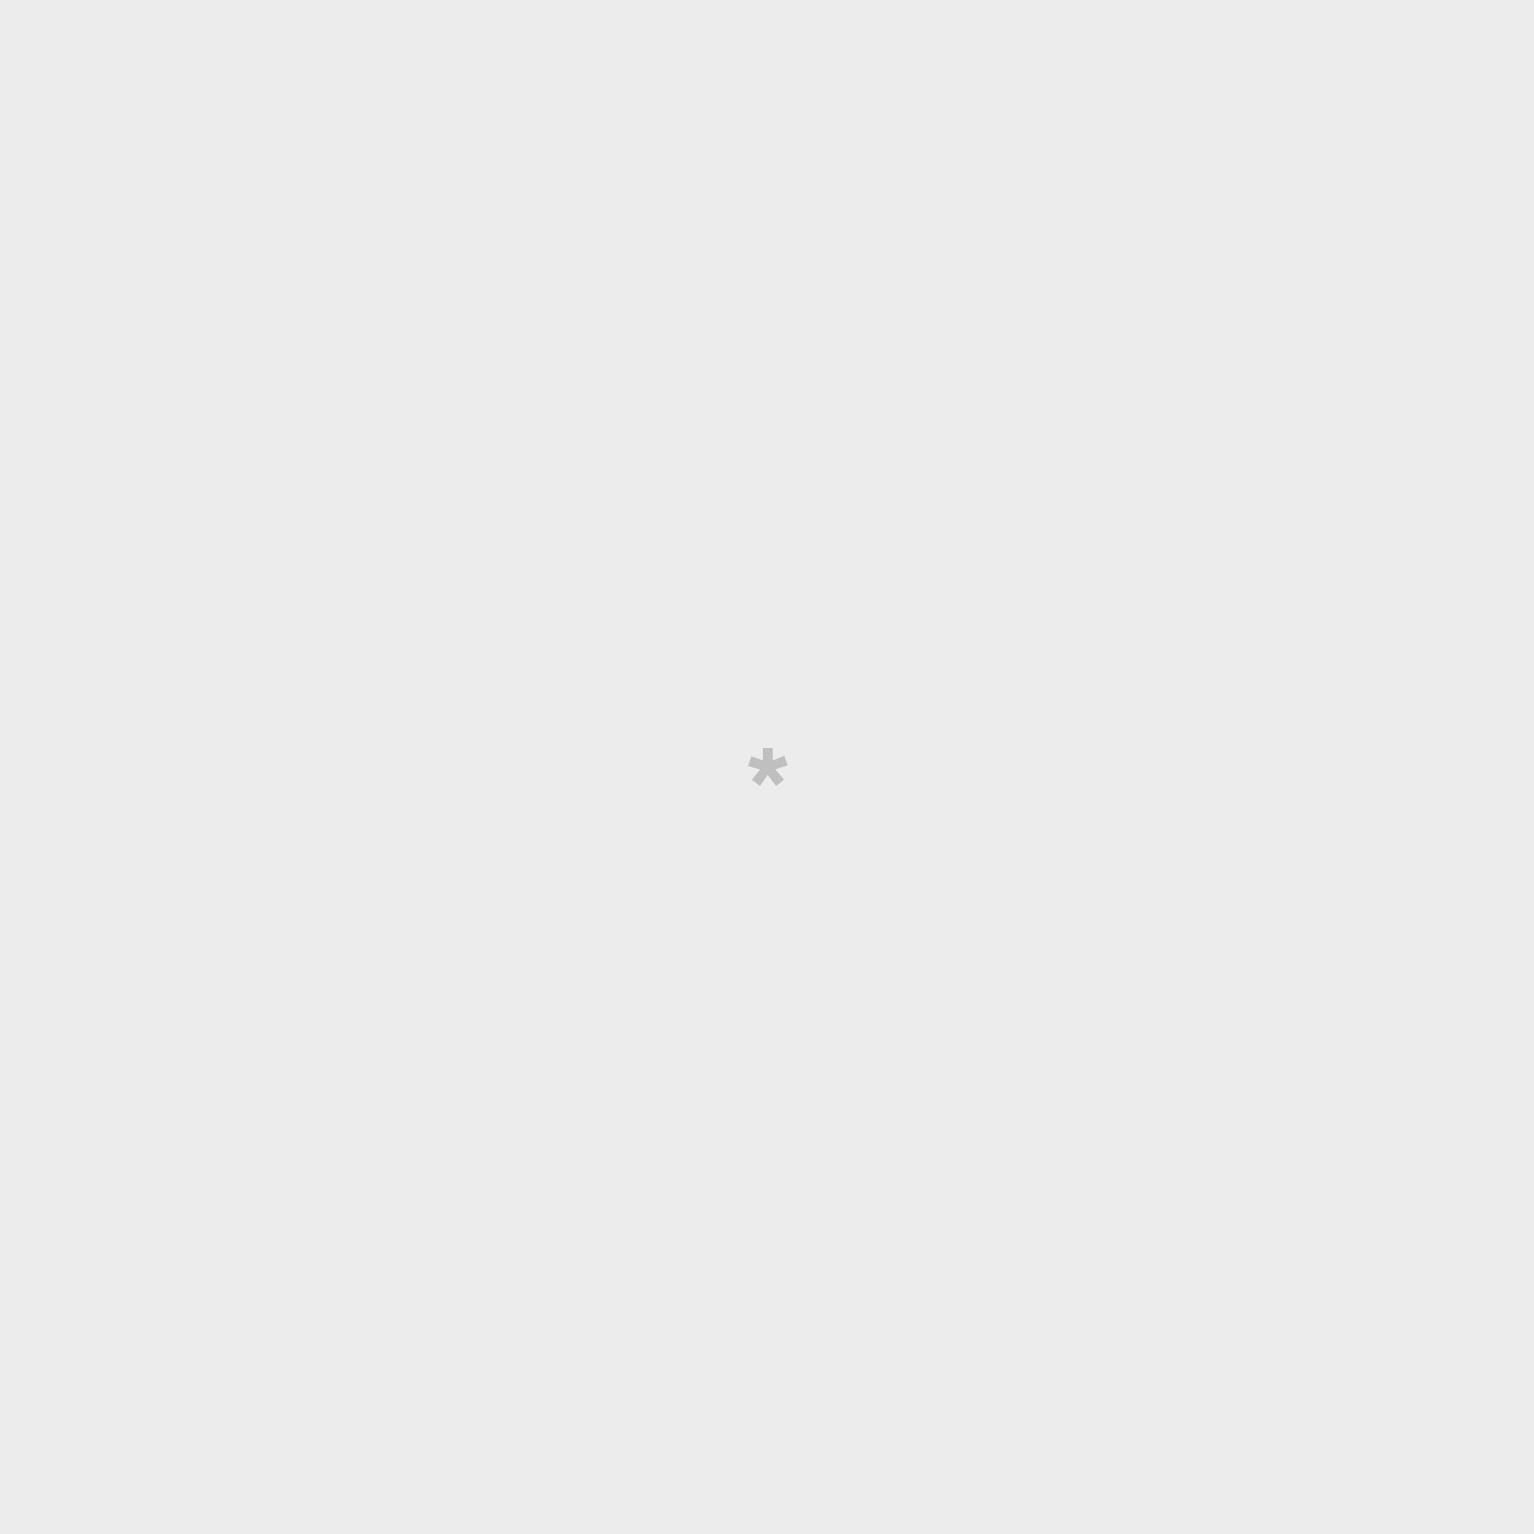 Album photo voyage - Let's get lost somewhere